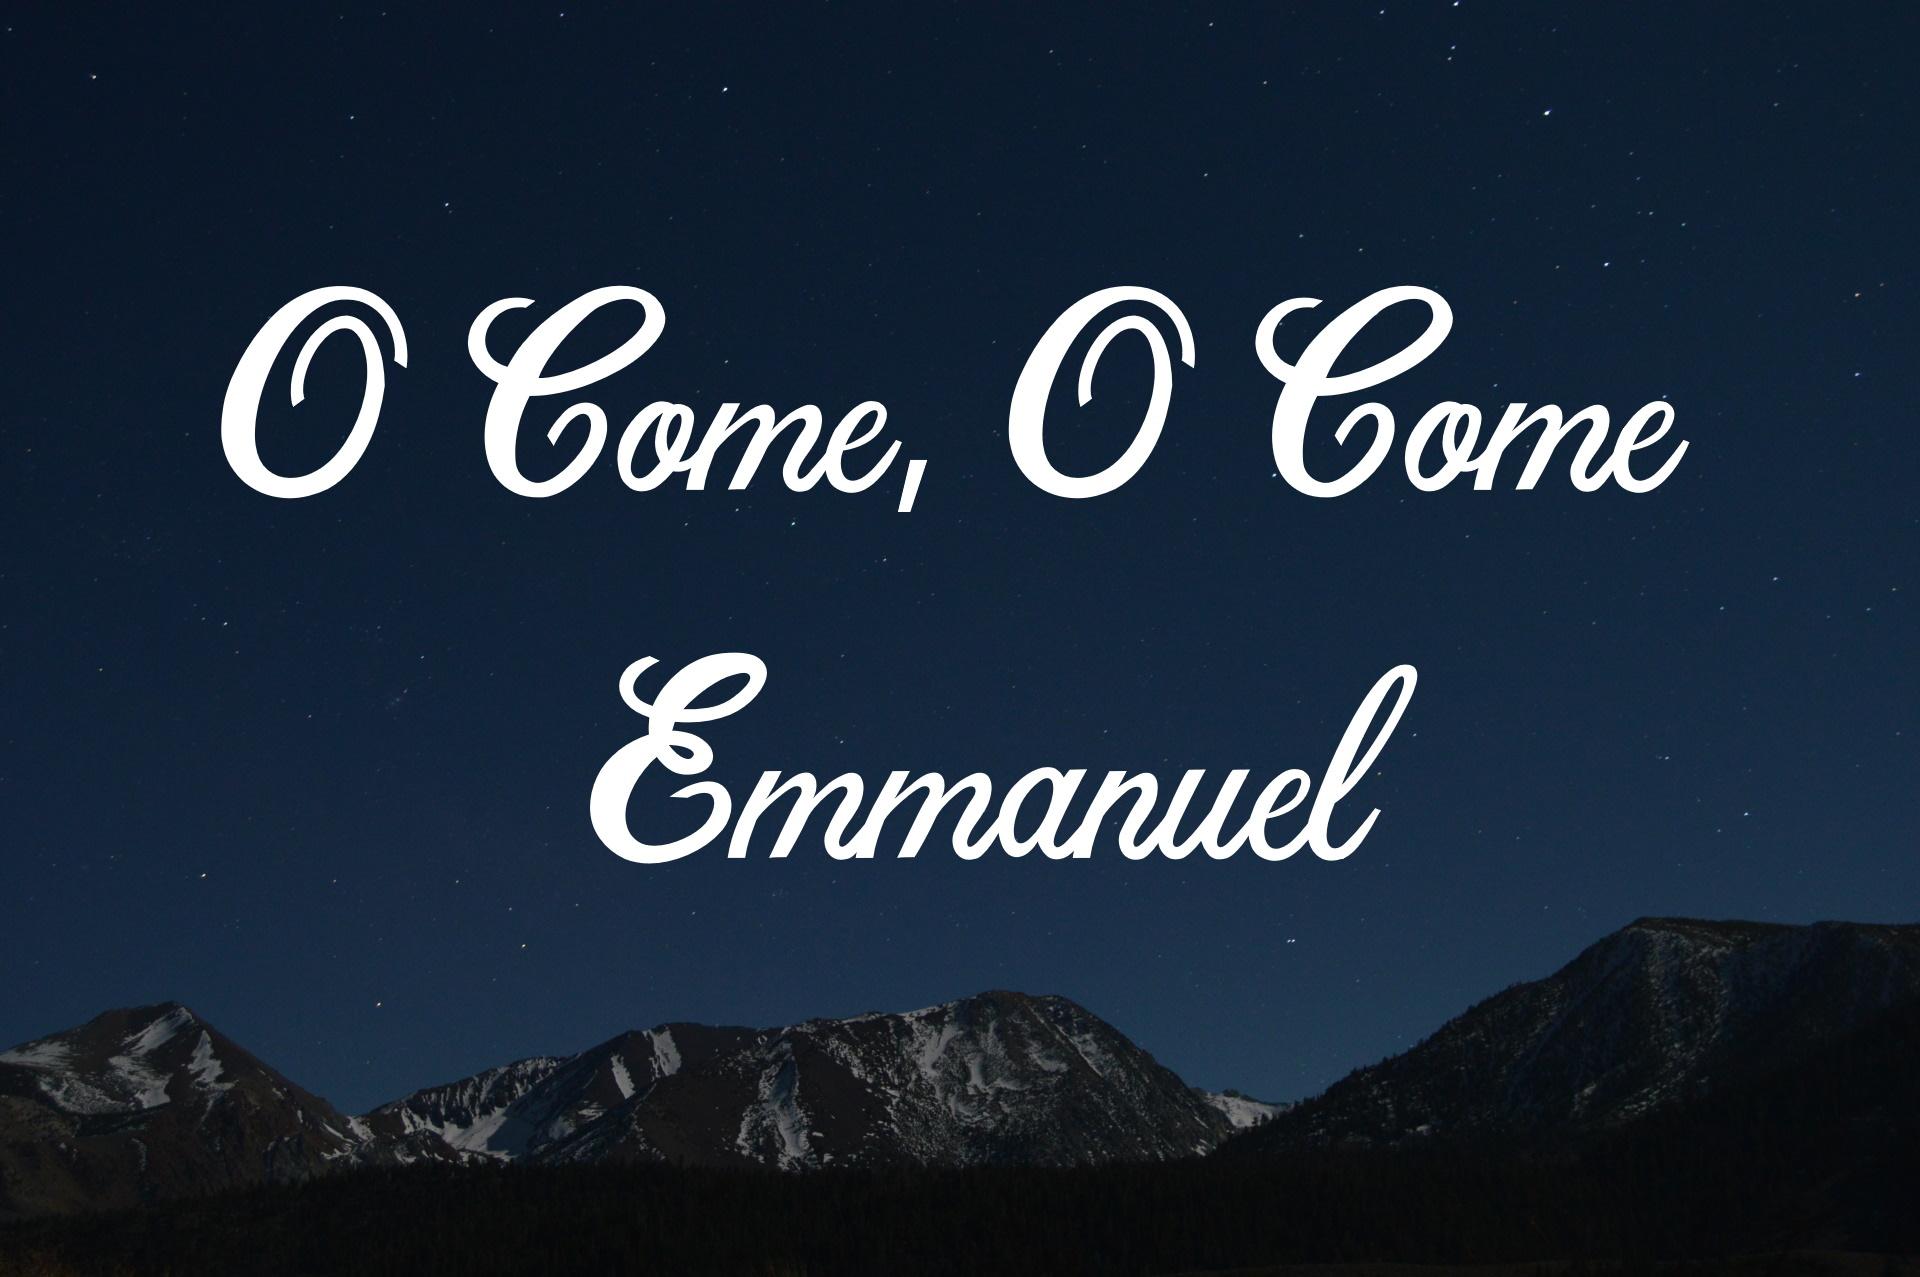 O Come, O Come Emmanuel: Meaning